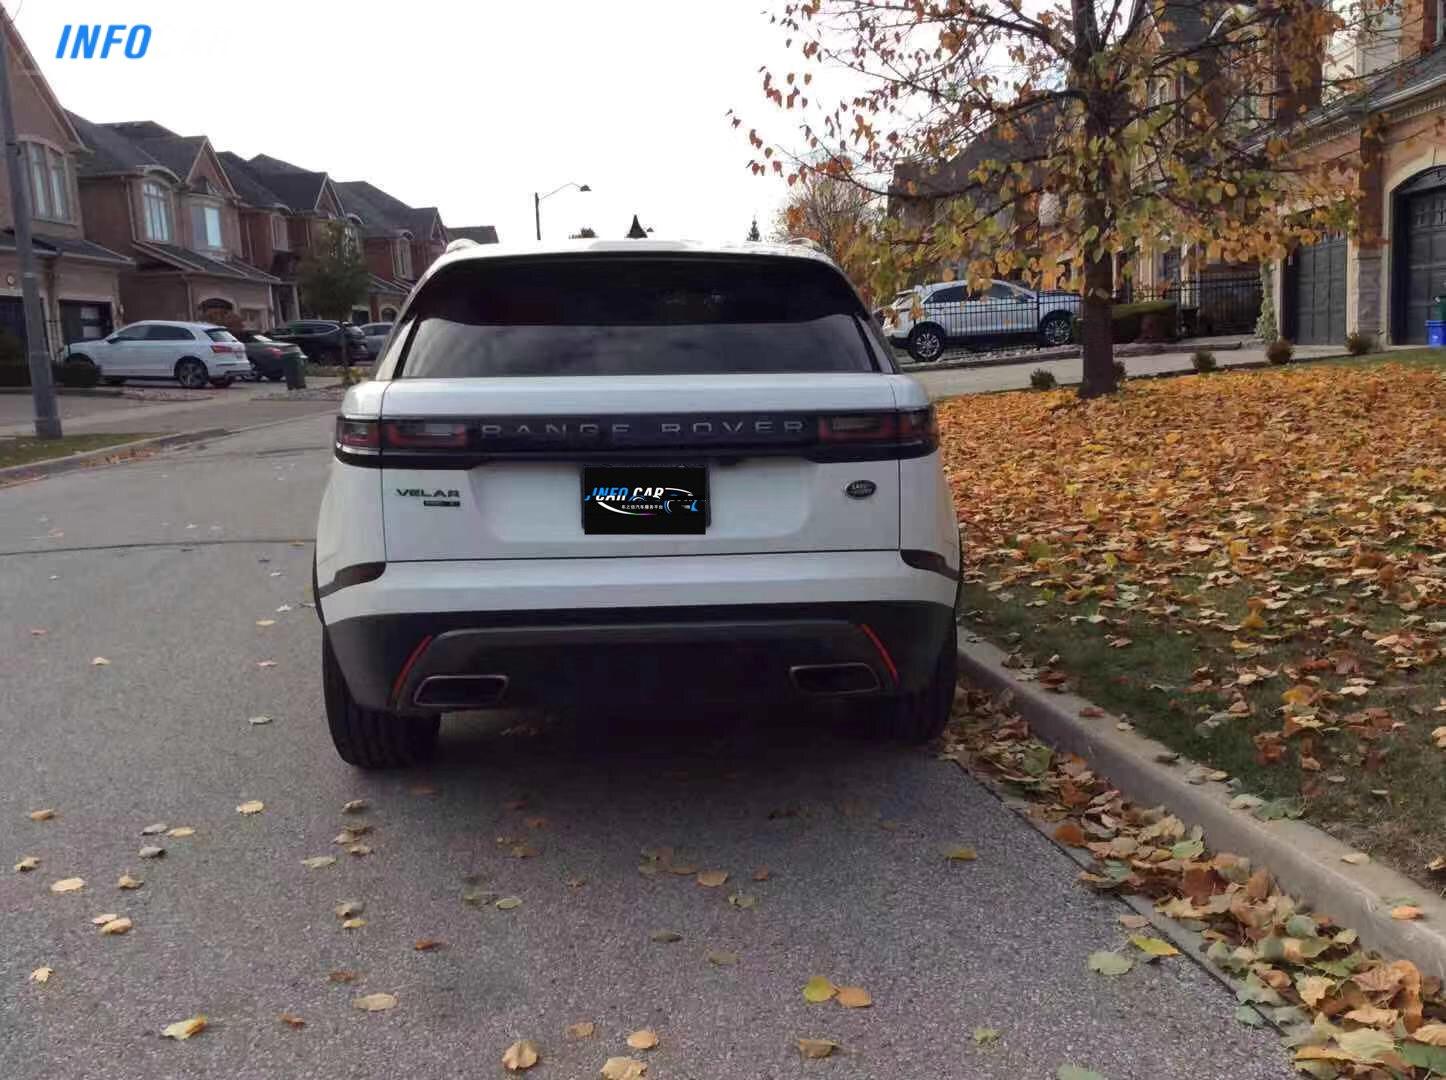 2020 Land Rover Range Rover Velar  - INFOCAR - Toronto's Most Comprehensive New and Used Auto Trading Platform